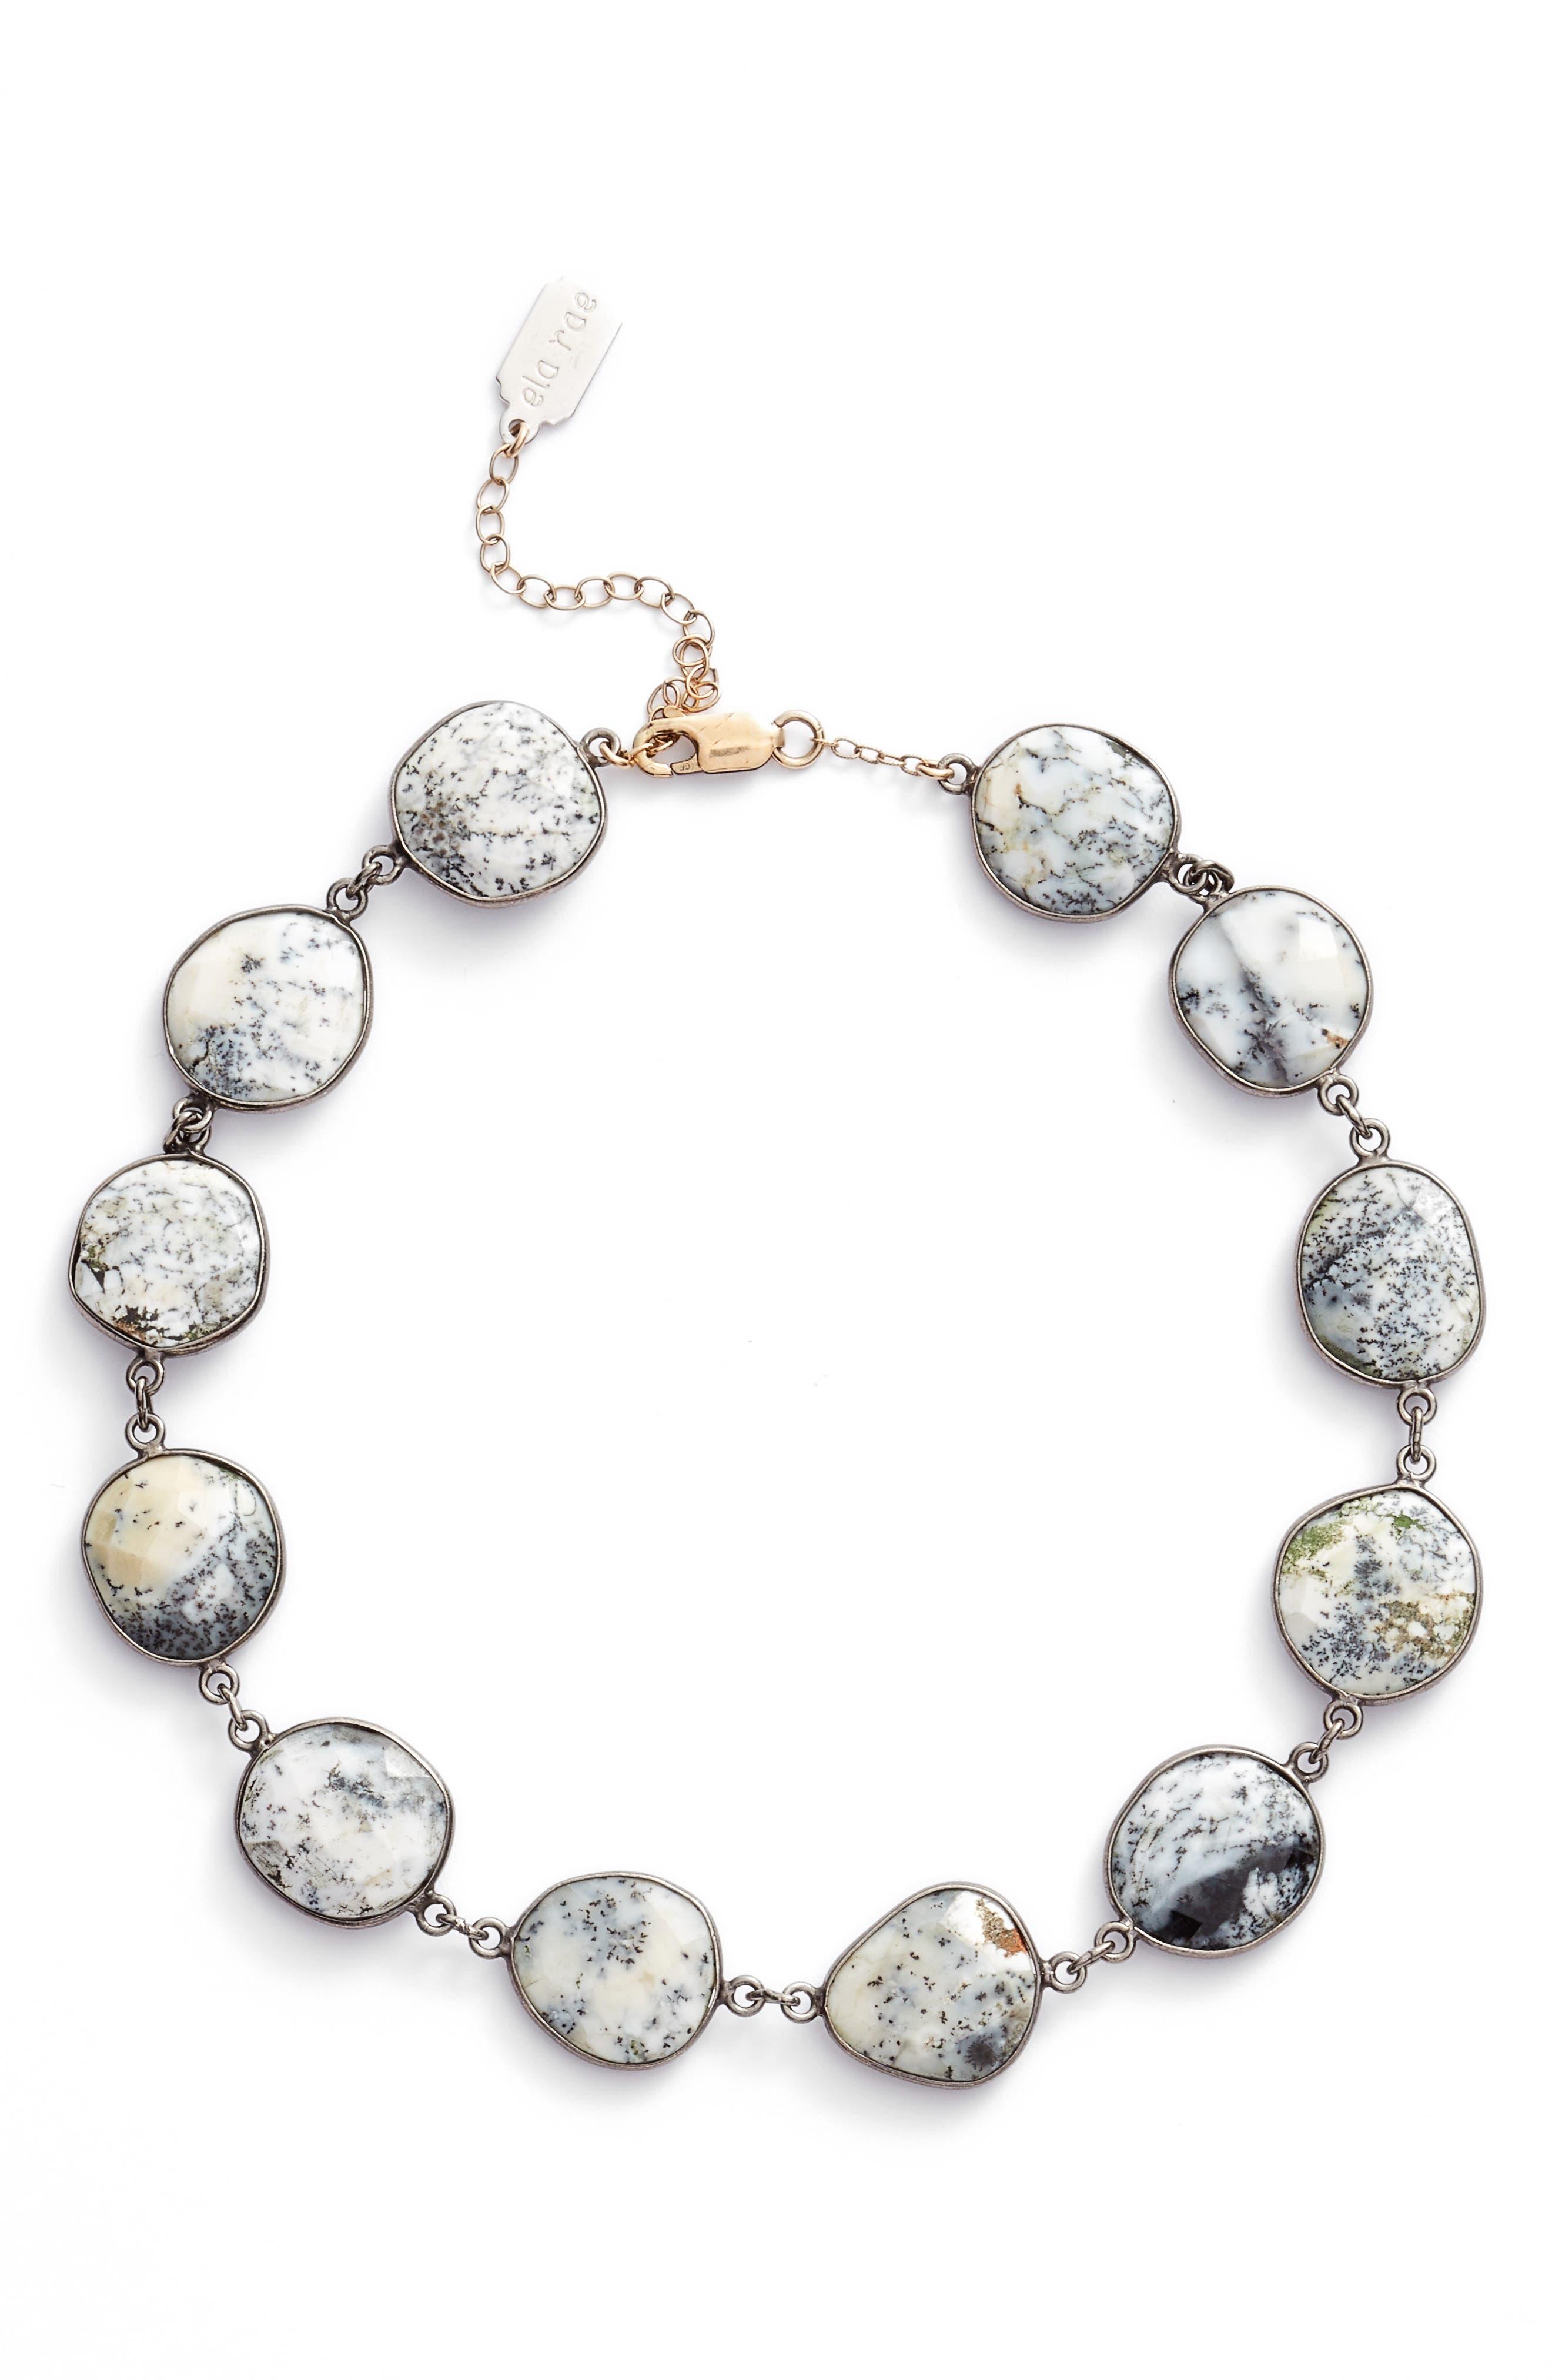 ela rae Suze Semiprecious Stone Collar Necklace